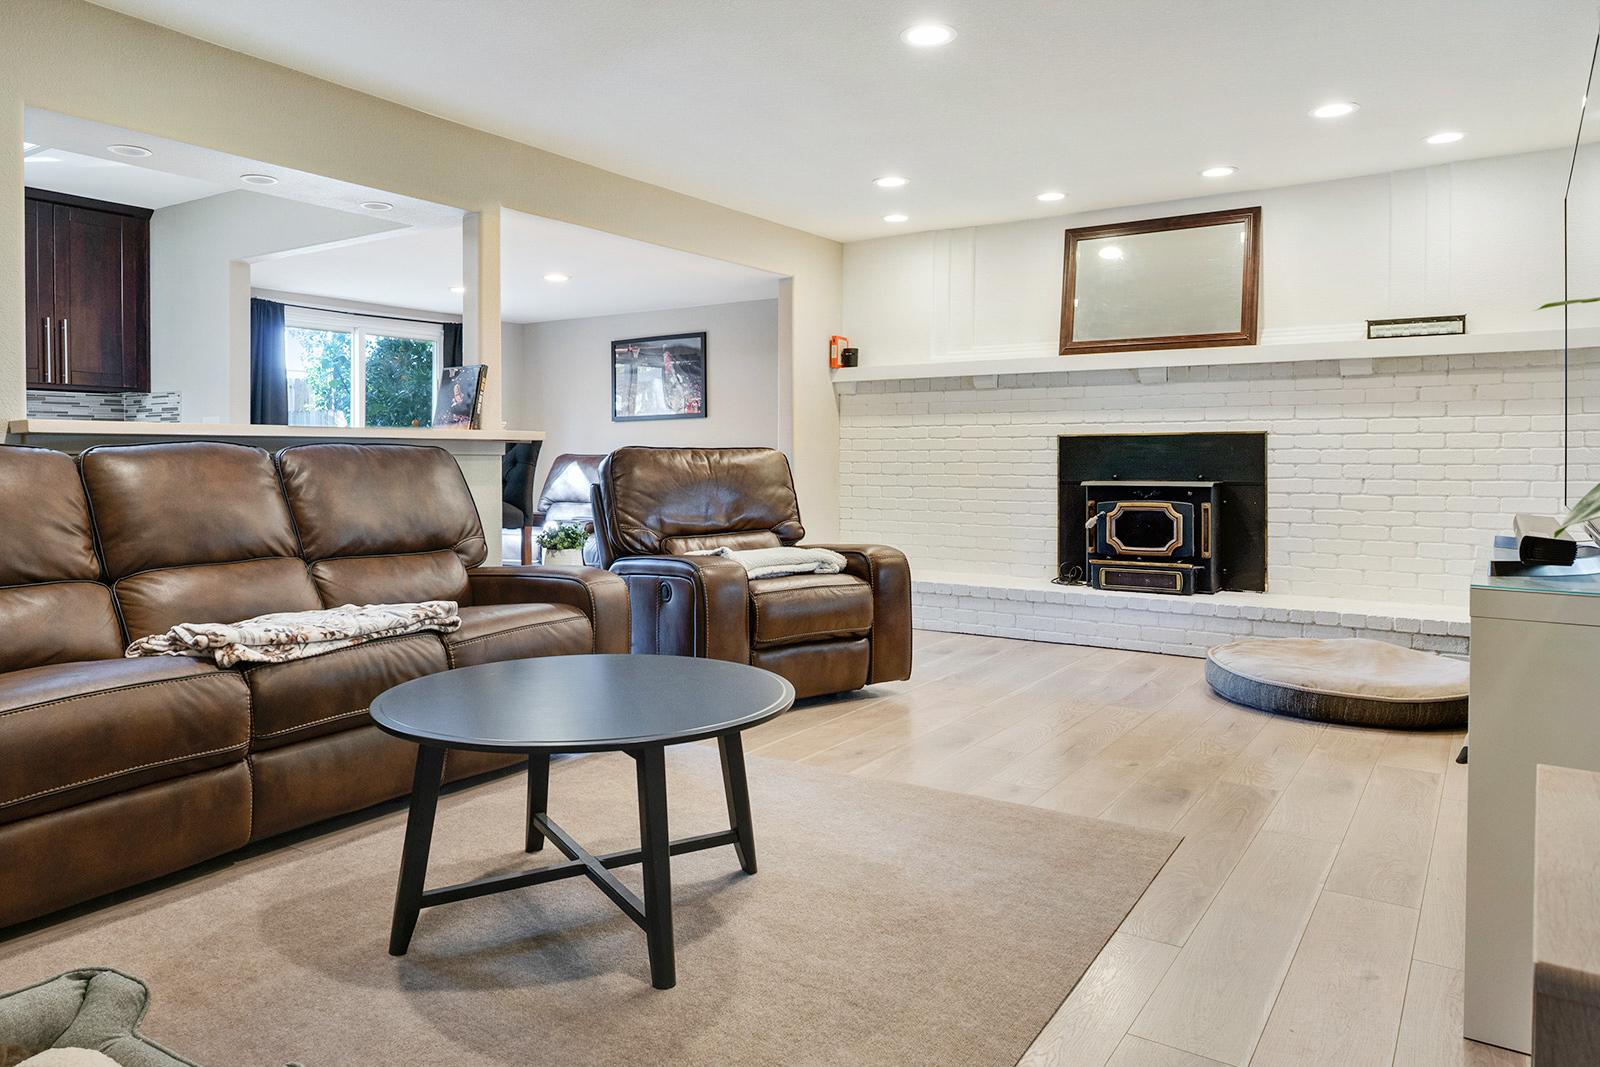 Living room of the home at 6235 Everest Way, Sacramento, Ca.